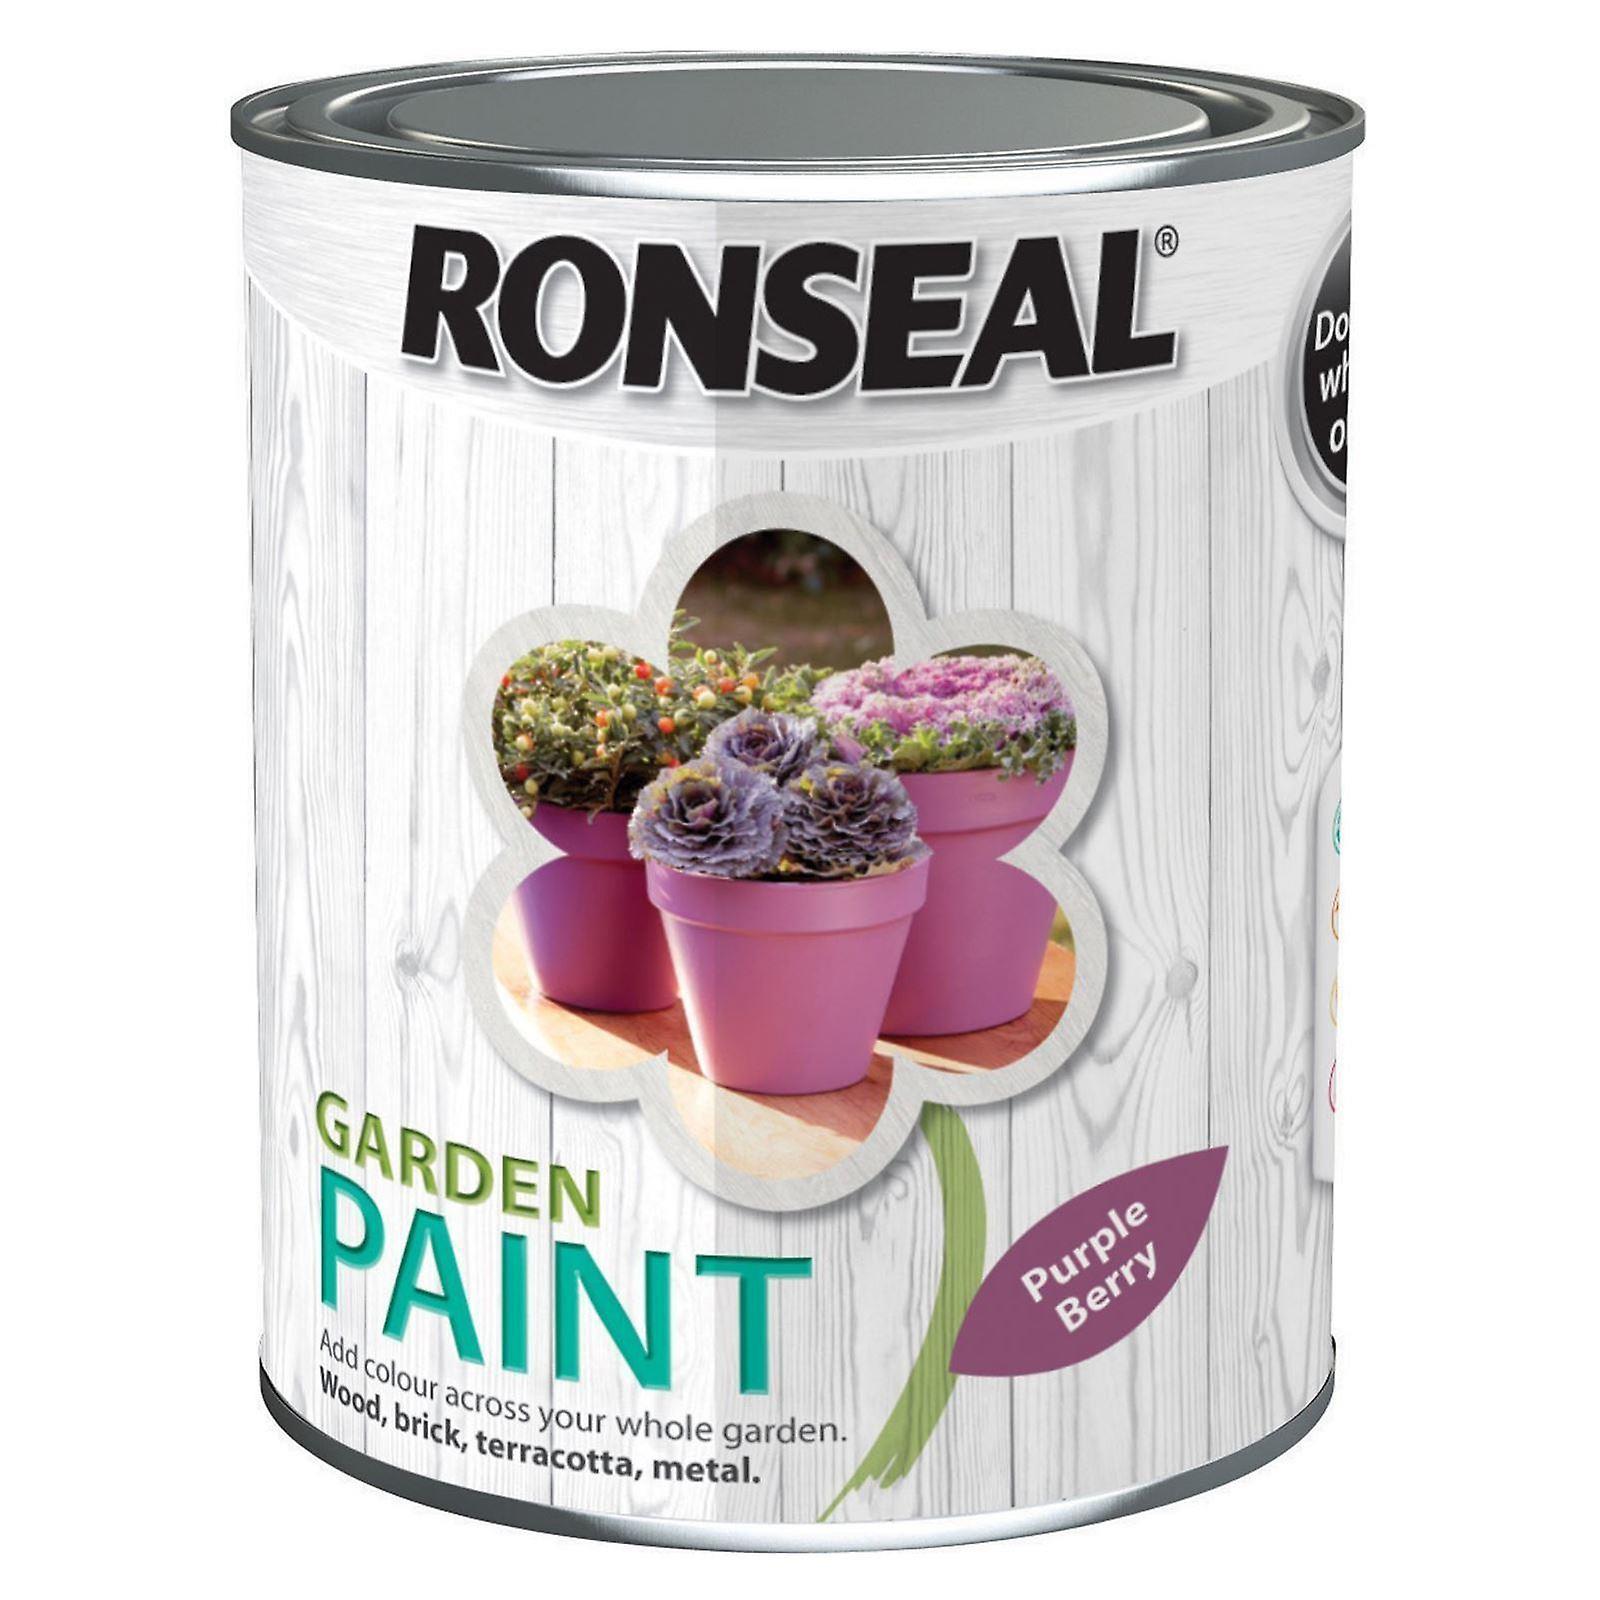 Ronseal Garden Paint 2.5L - Purple Berry